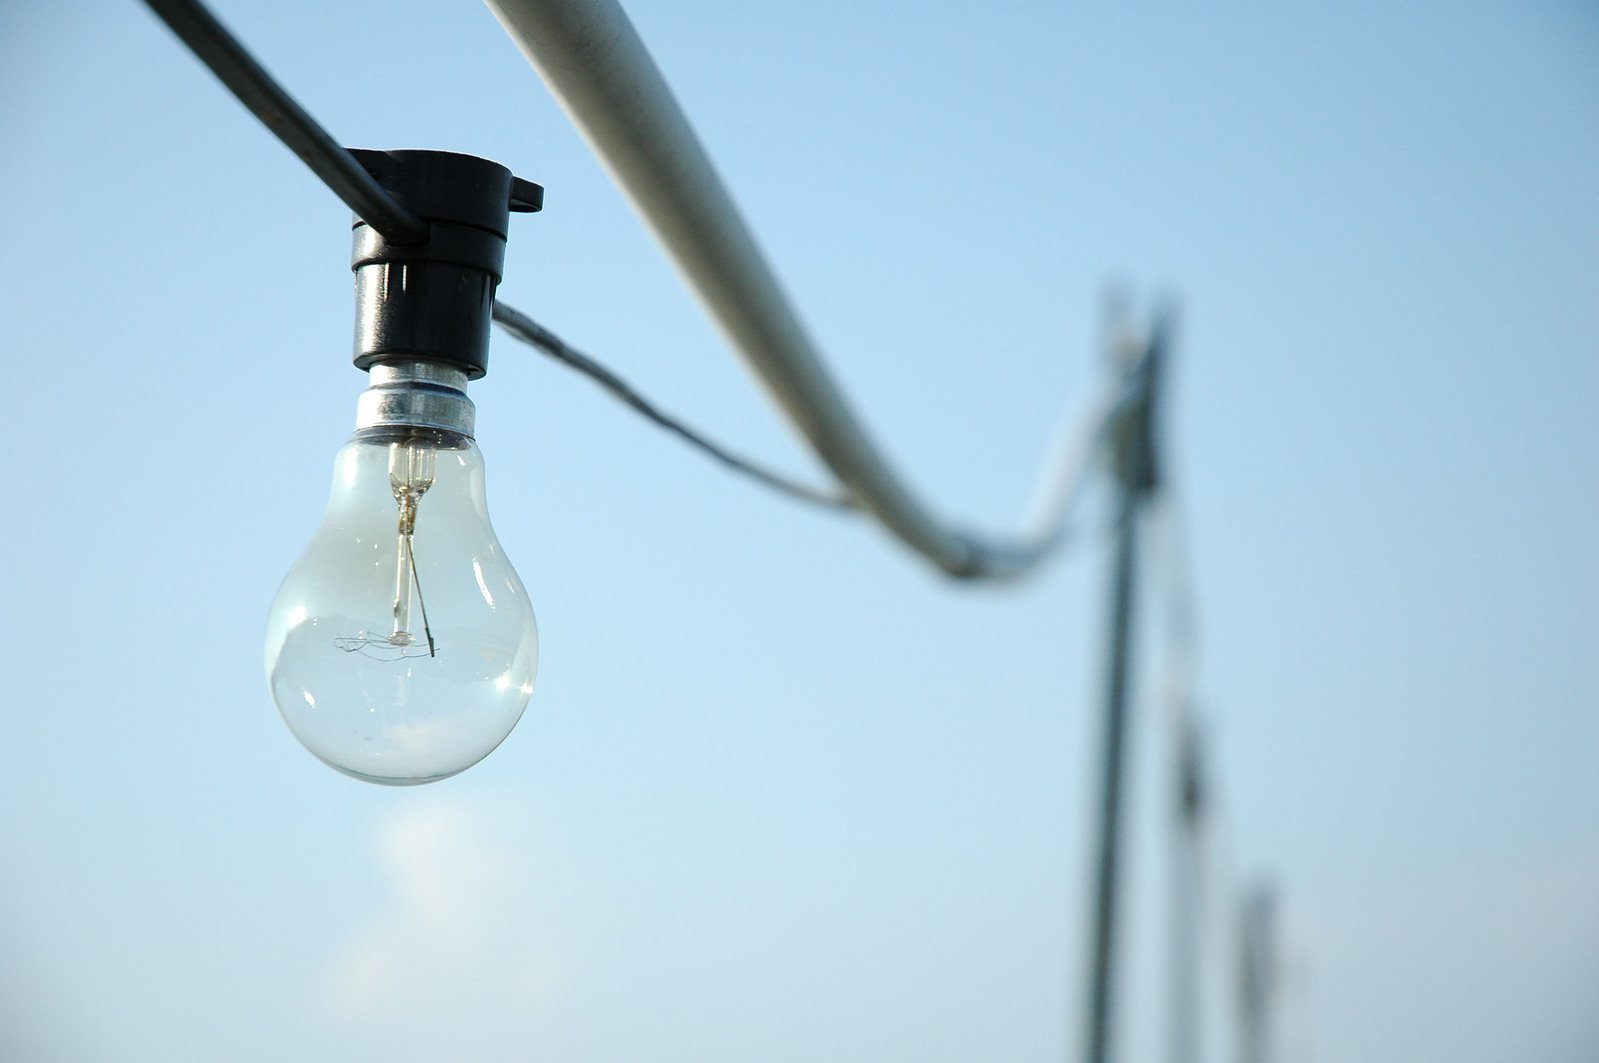 lonely-bulb-1532511.jpg